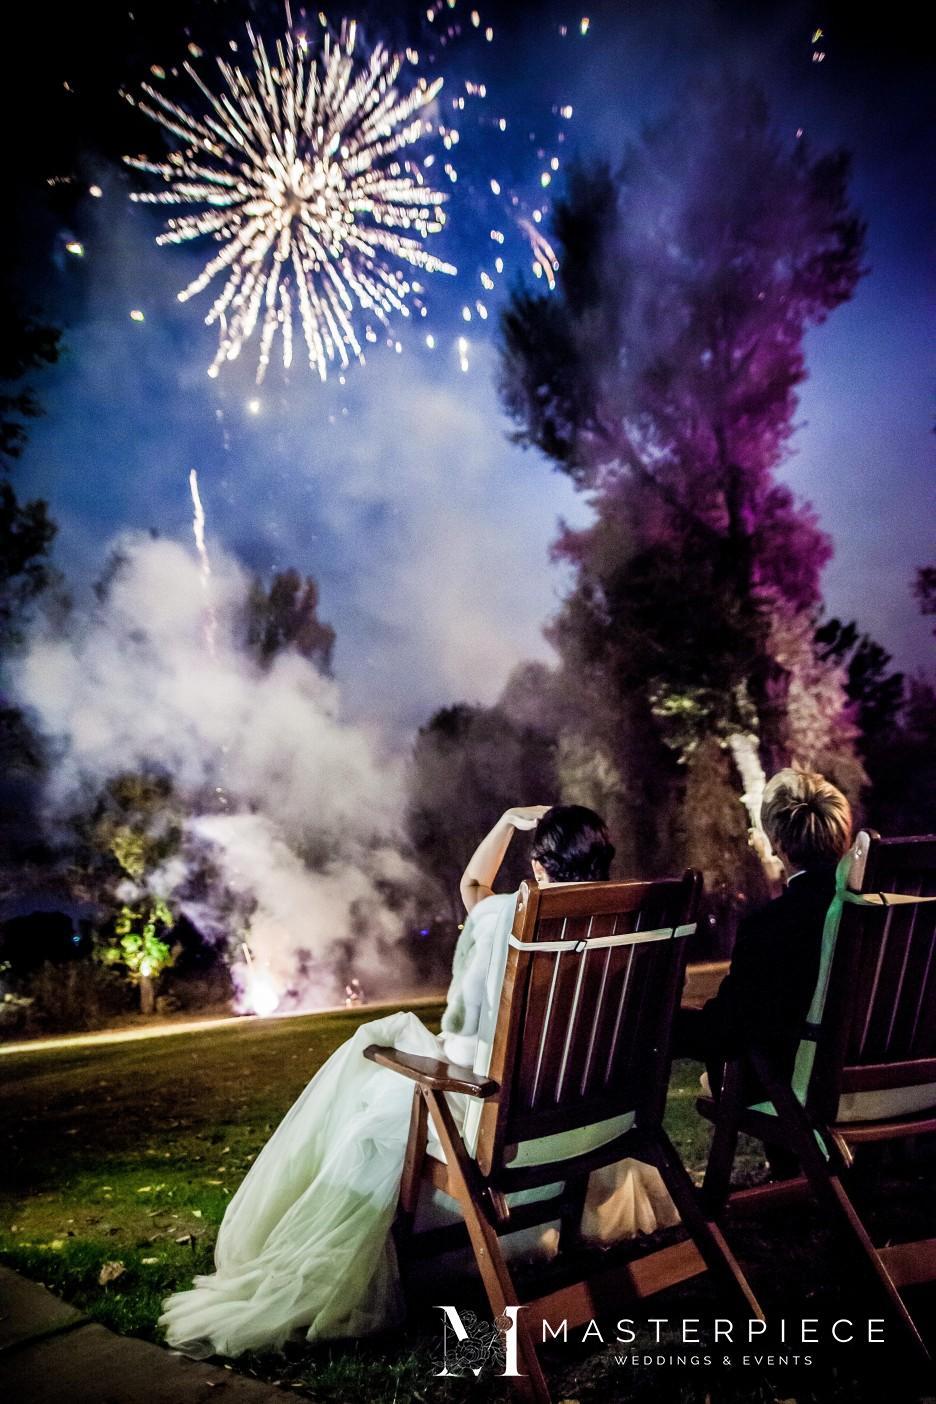 Masterpiece_Weddings_sluby_014